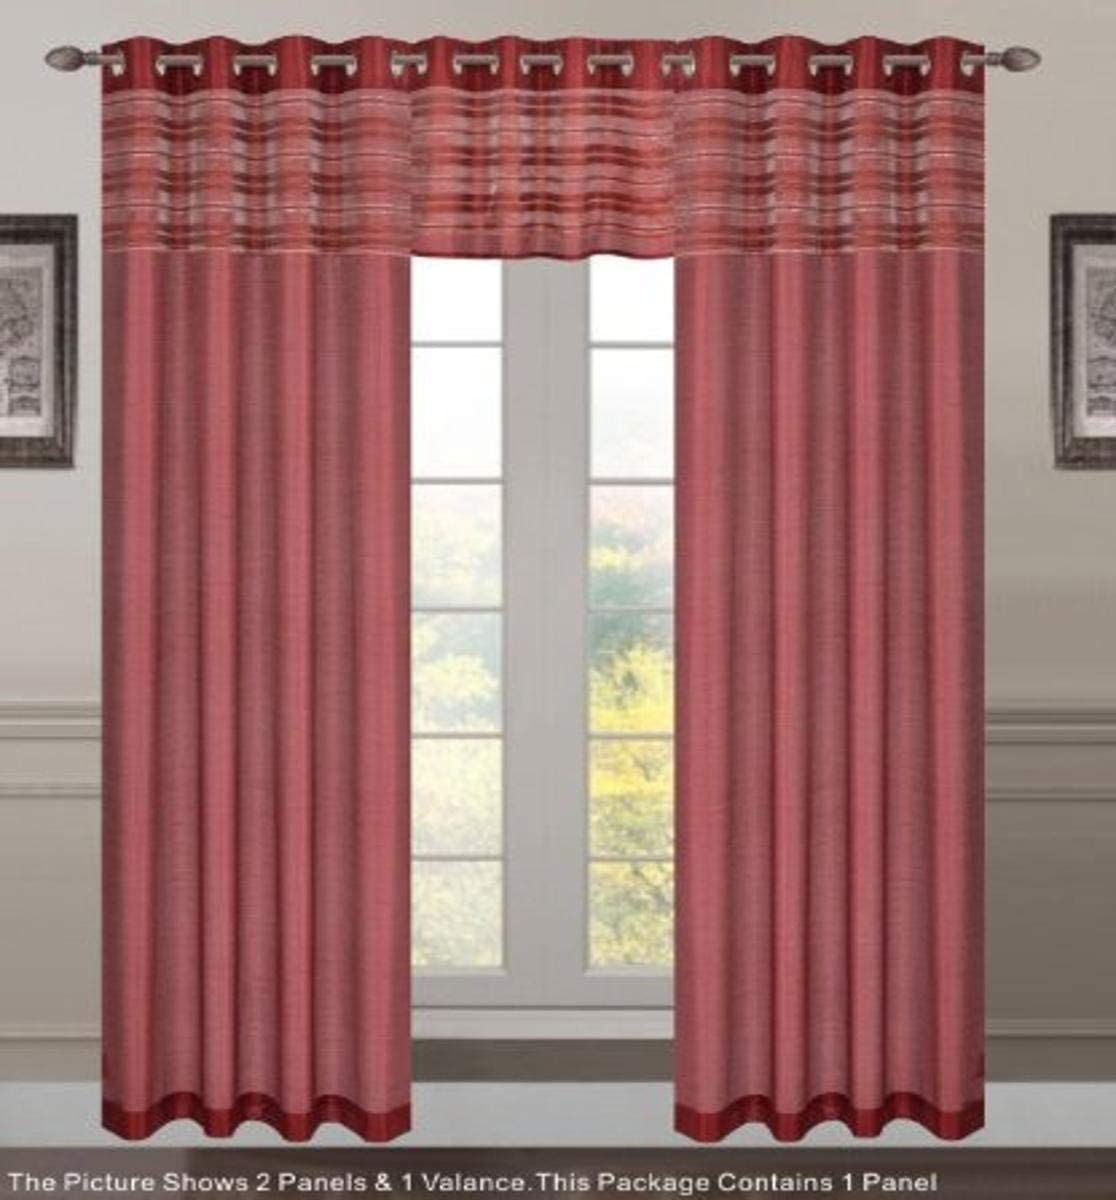 Dainty Home Barcelona Grommet Window Panel, 55 by 84-Inch, Dark Burgundy